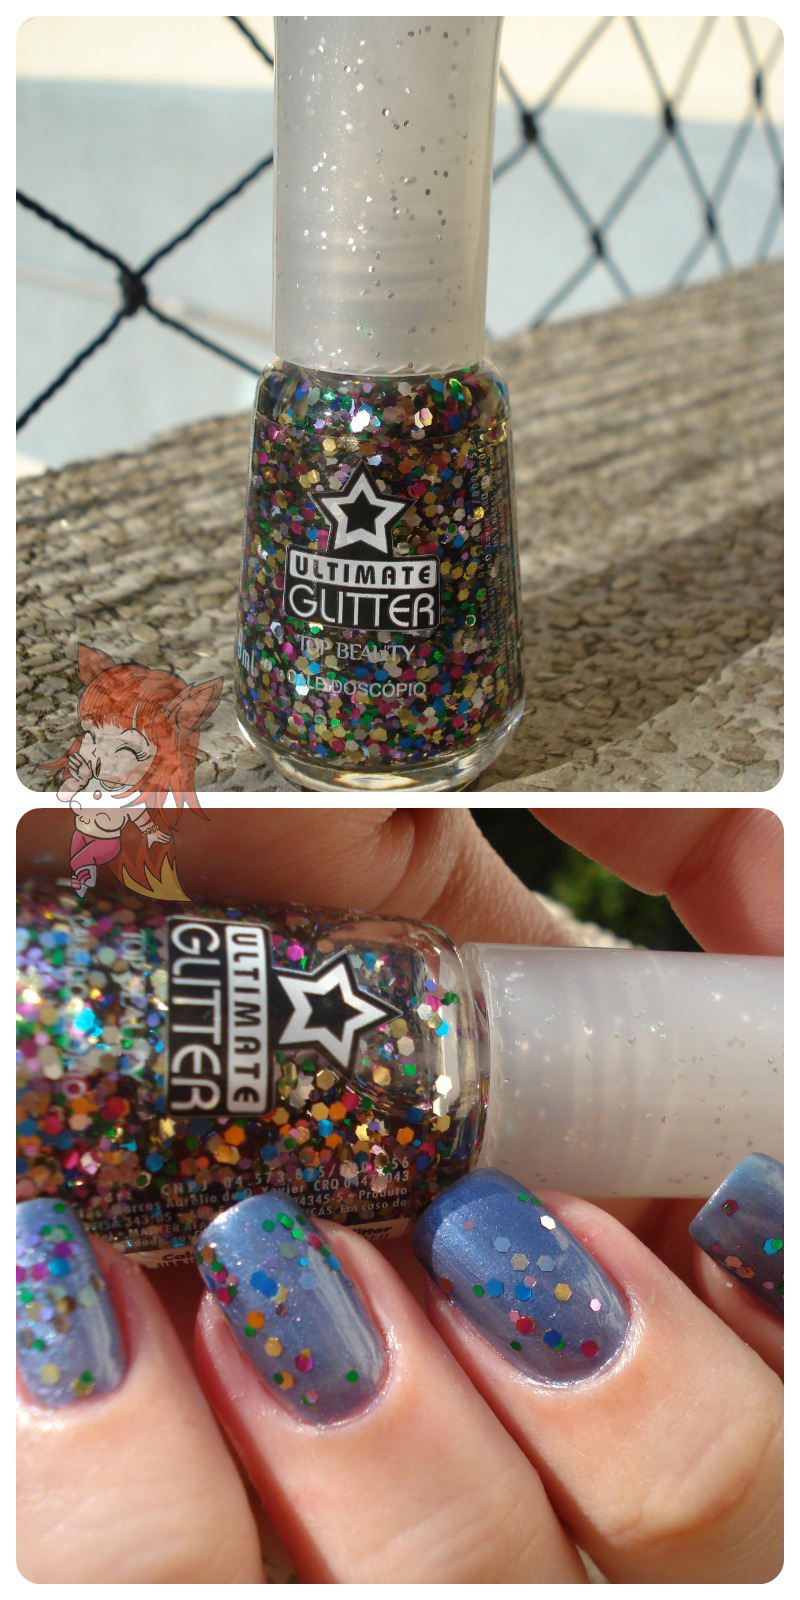 Esmalte Top Beauty :: Buquê de Flores + Glitter Caleidoscópio